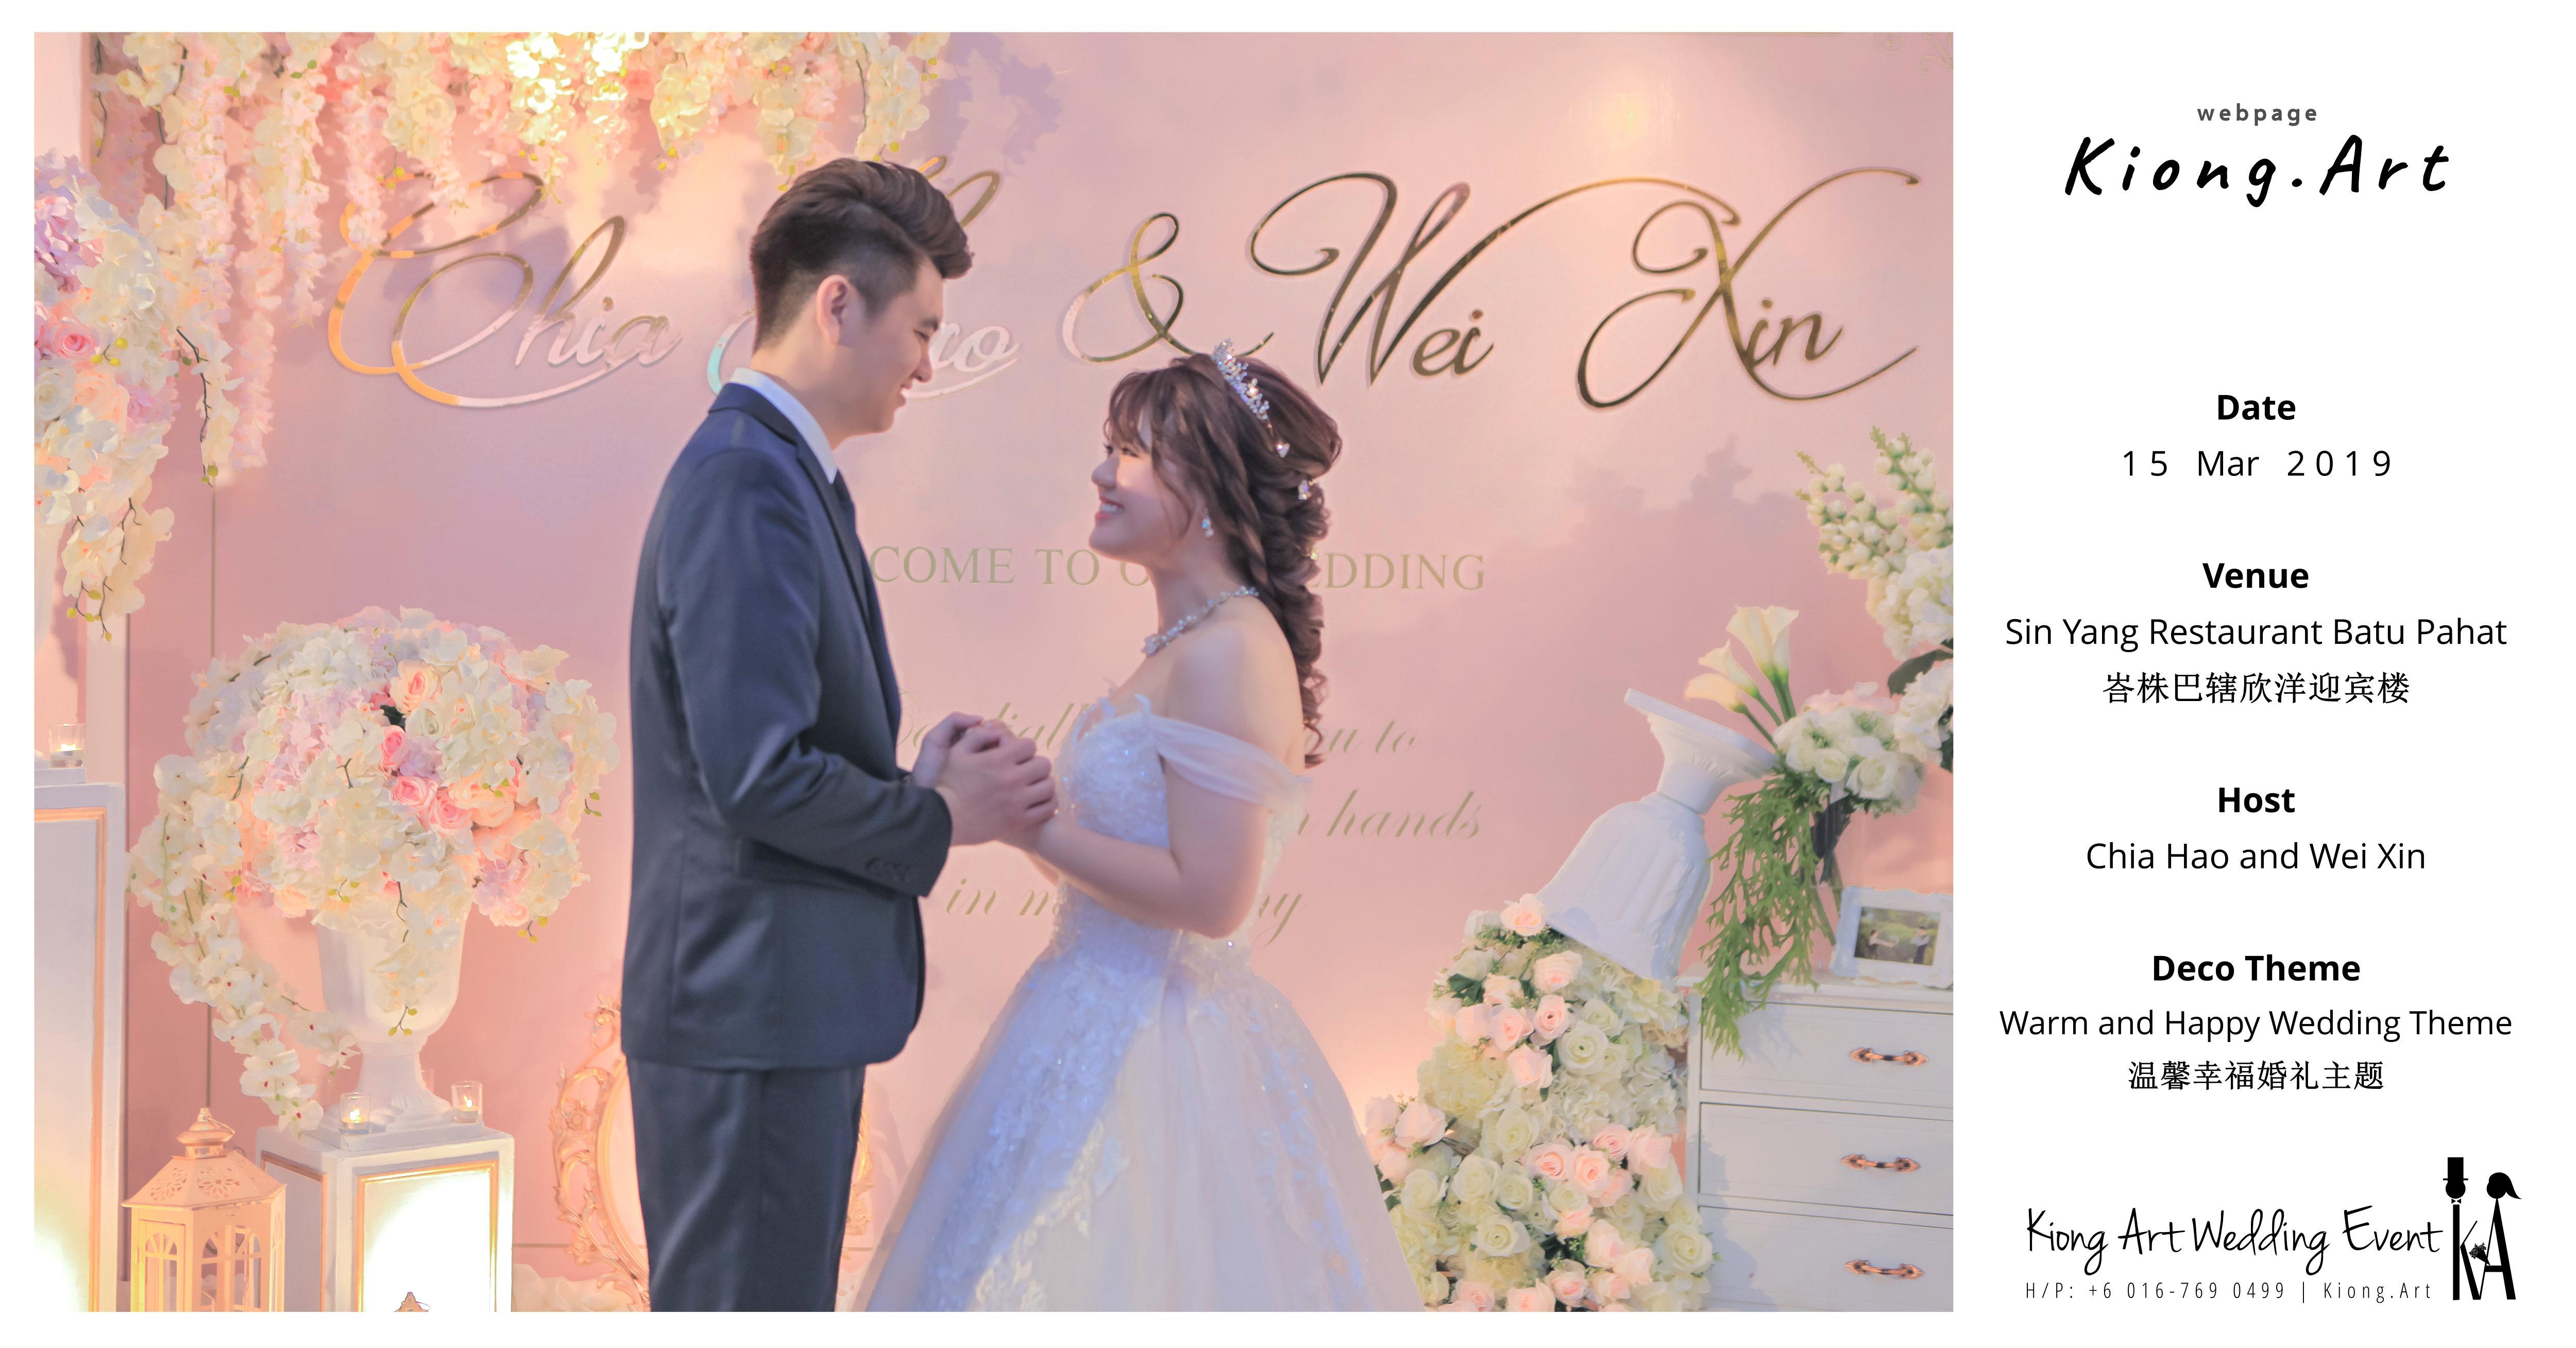 Malaysia Wed Kuala Lumpur Wedding Deco Decoration Kiong Art Wedding Deco Warm and Happy Wedding Theme Chia Hao and Wei Xin Sin Yang Restaurant Batu Pahat A15-A00-007